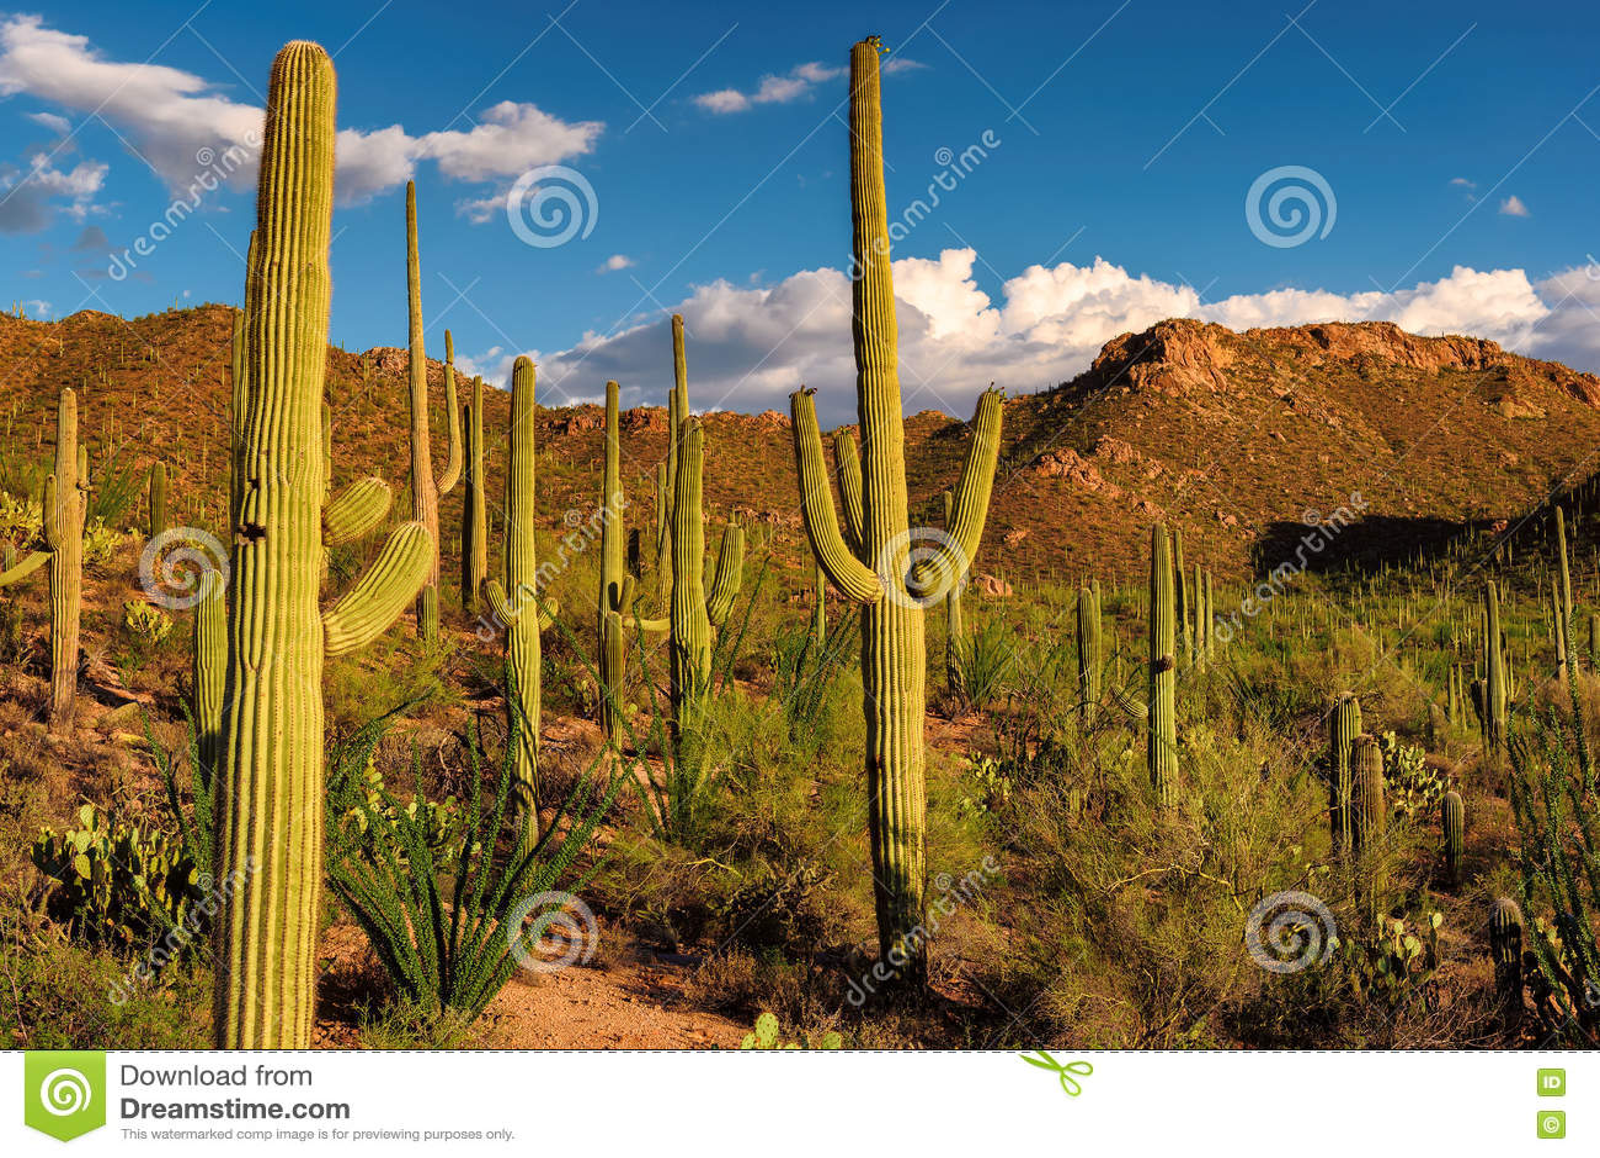 Saguaro Cactus at sunset in Saguaro National Park near Tucson, Arizona.